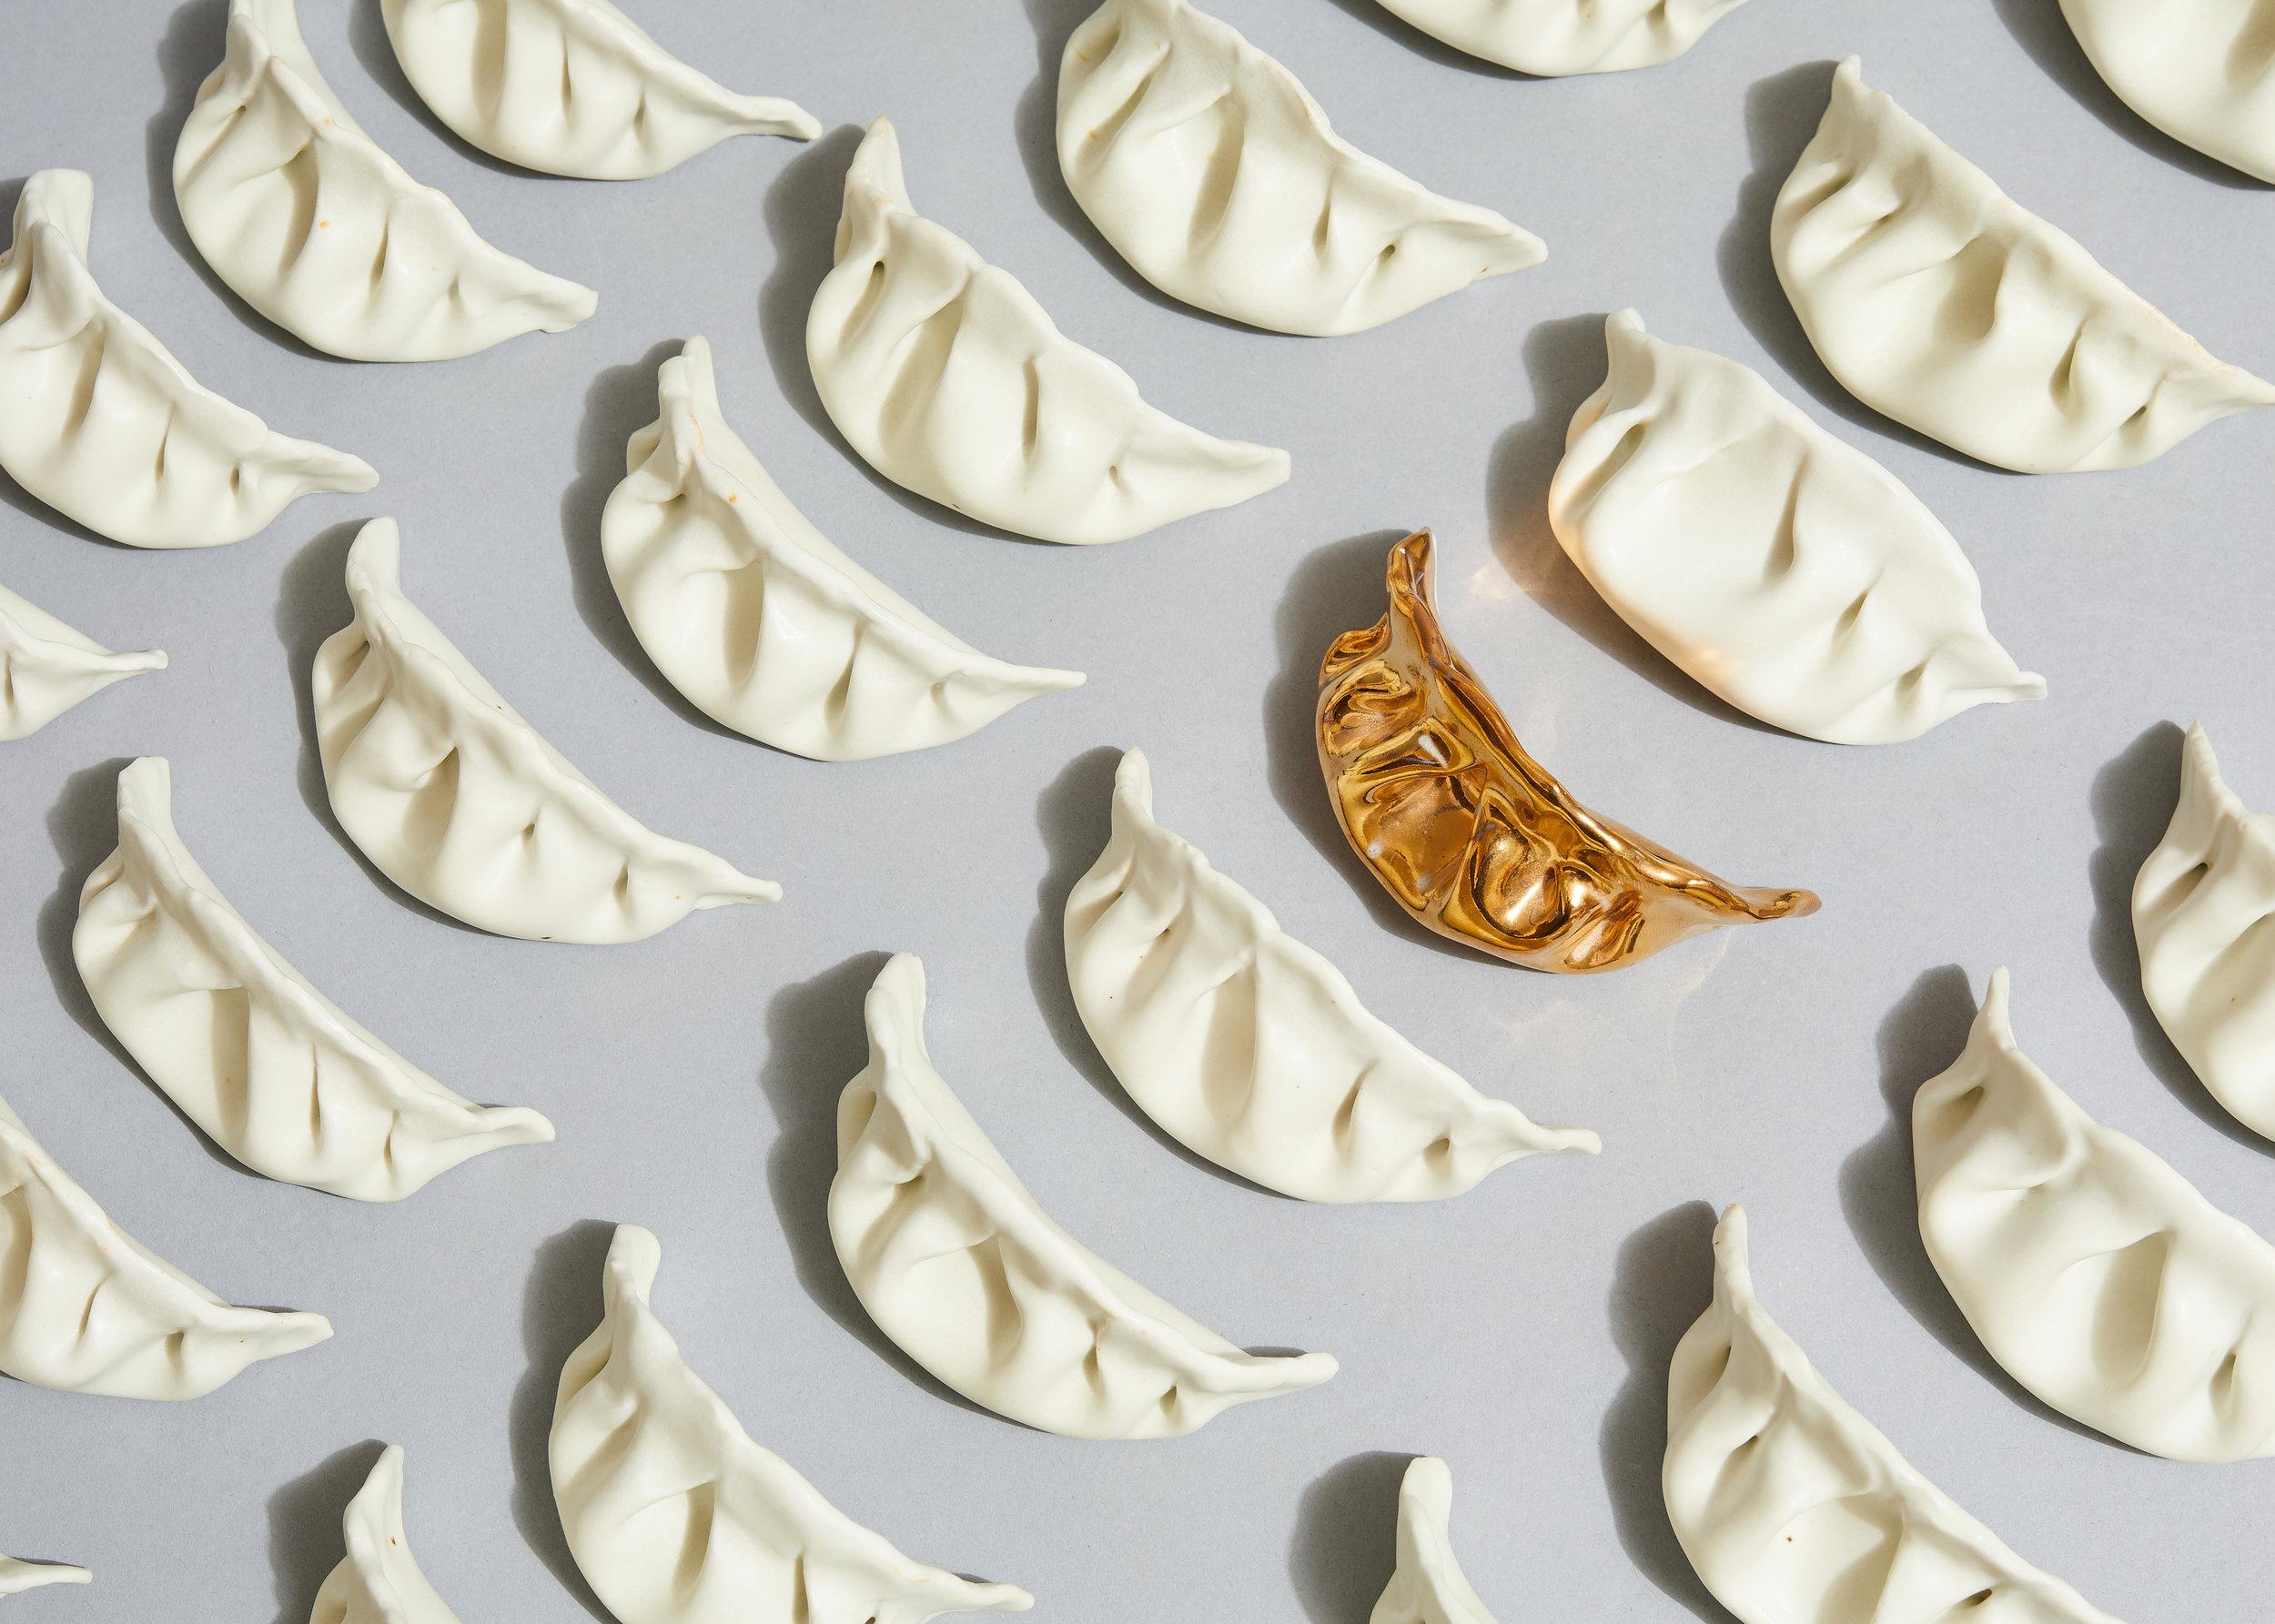 ShihStephanie_Dumplings_2.jpg